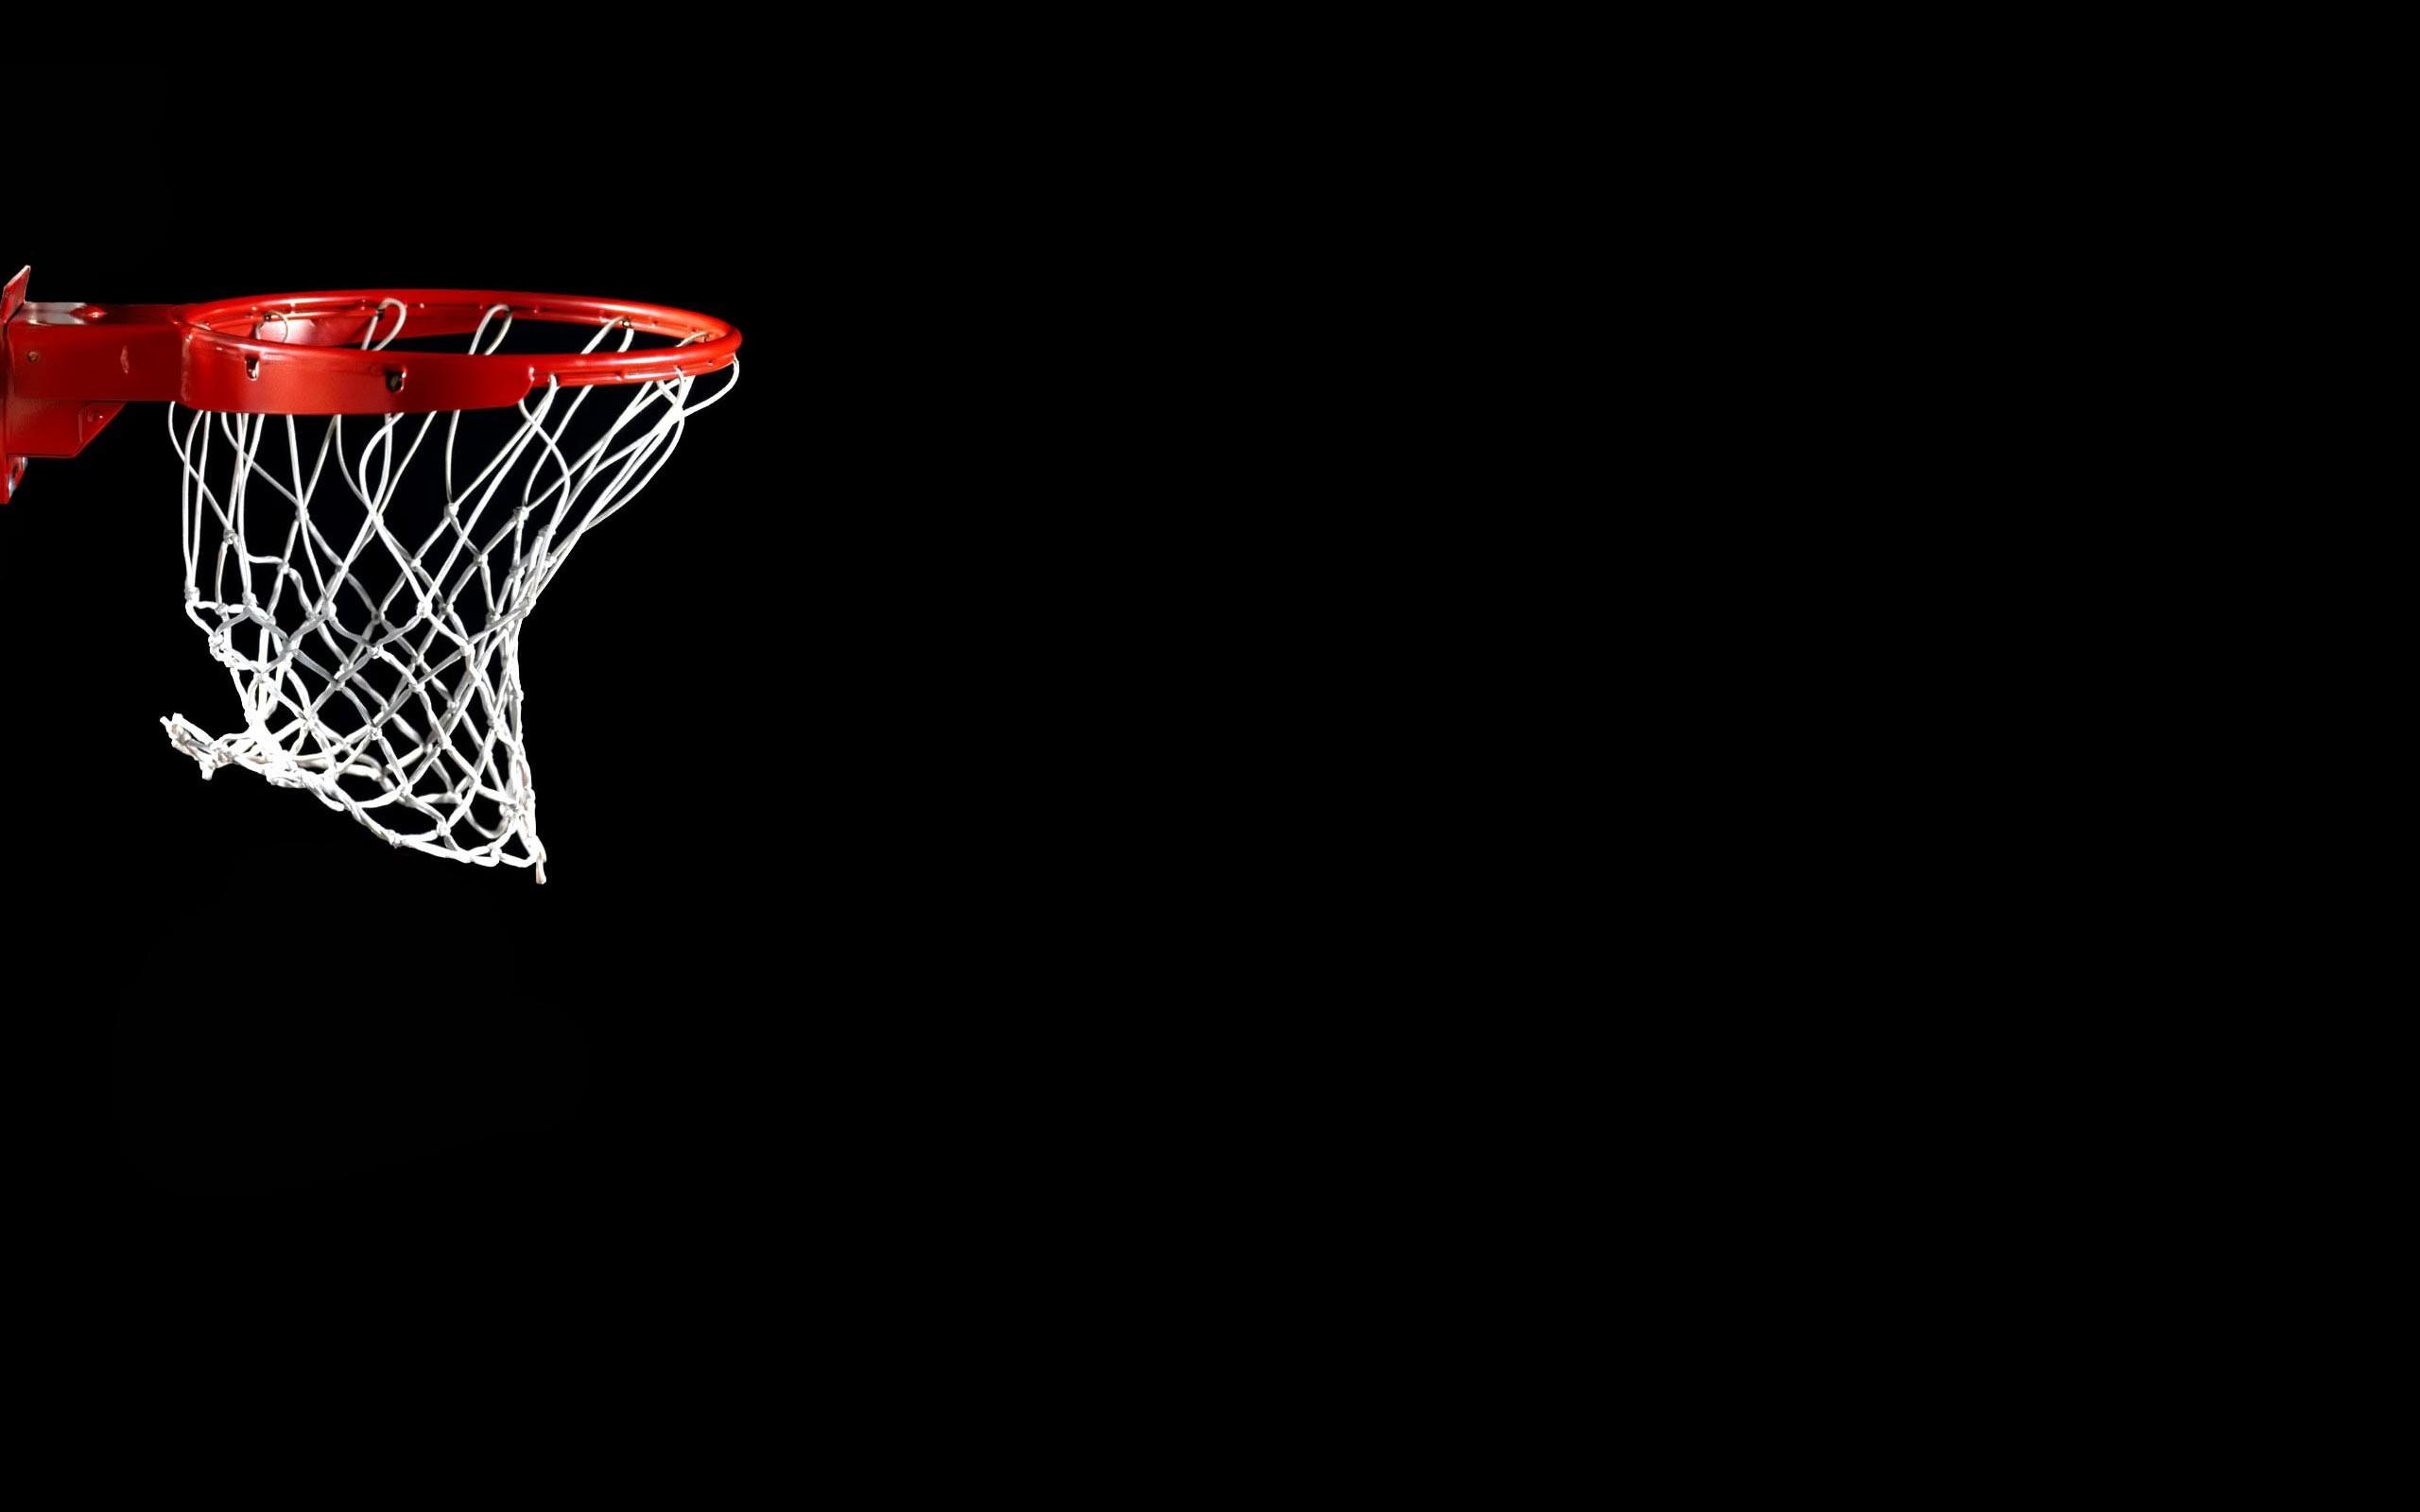 Free Basketball Wallpaper Download – https://www.youthsportfoto.com/free